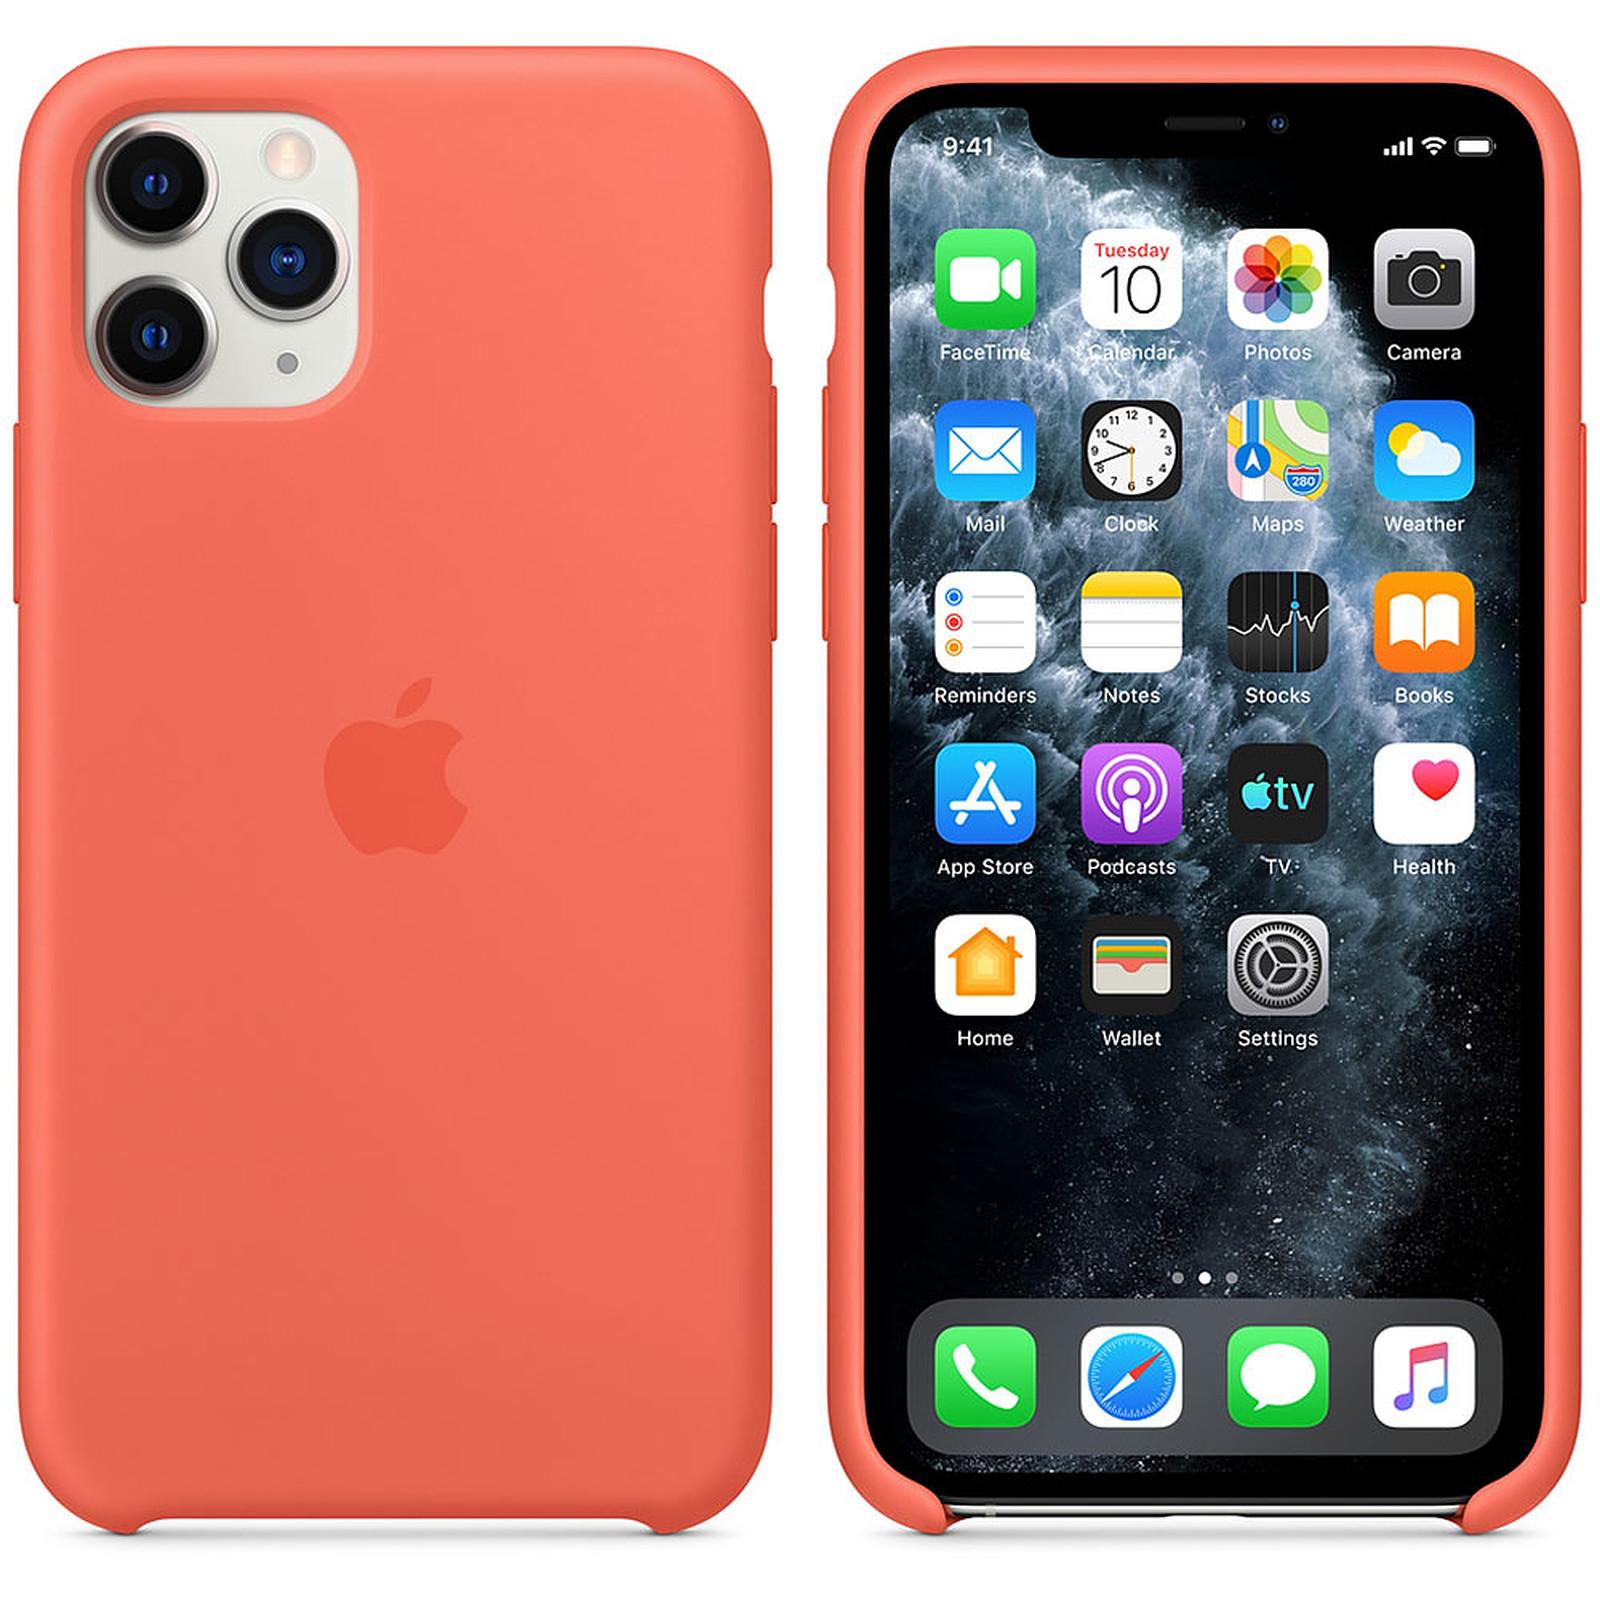 Apple Funda de silicona Clementine Apple iPhone 11 Pro